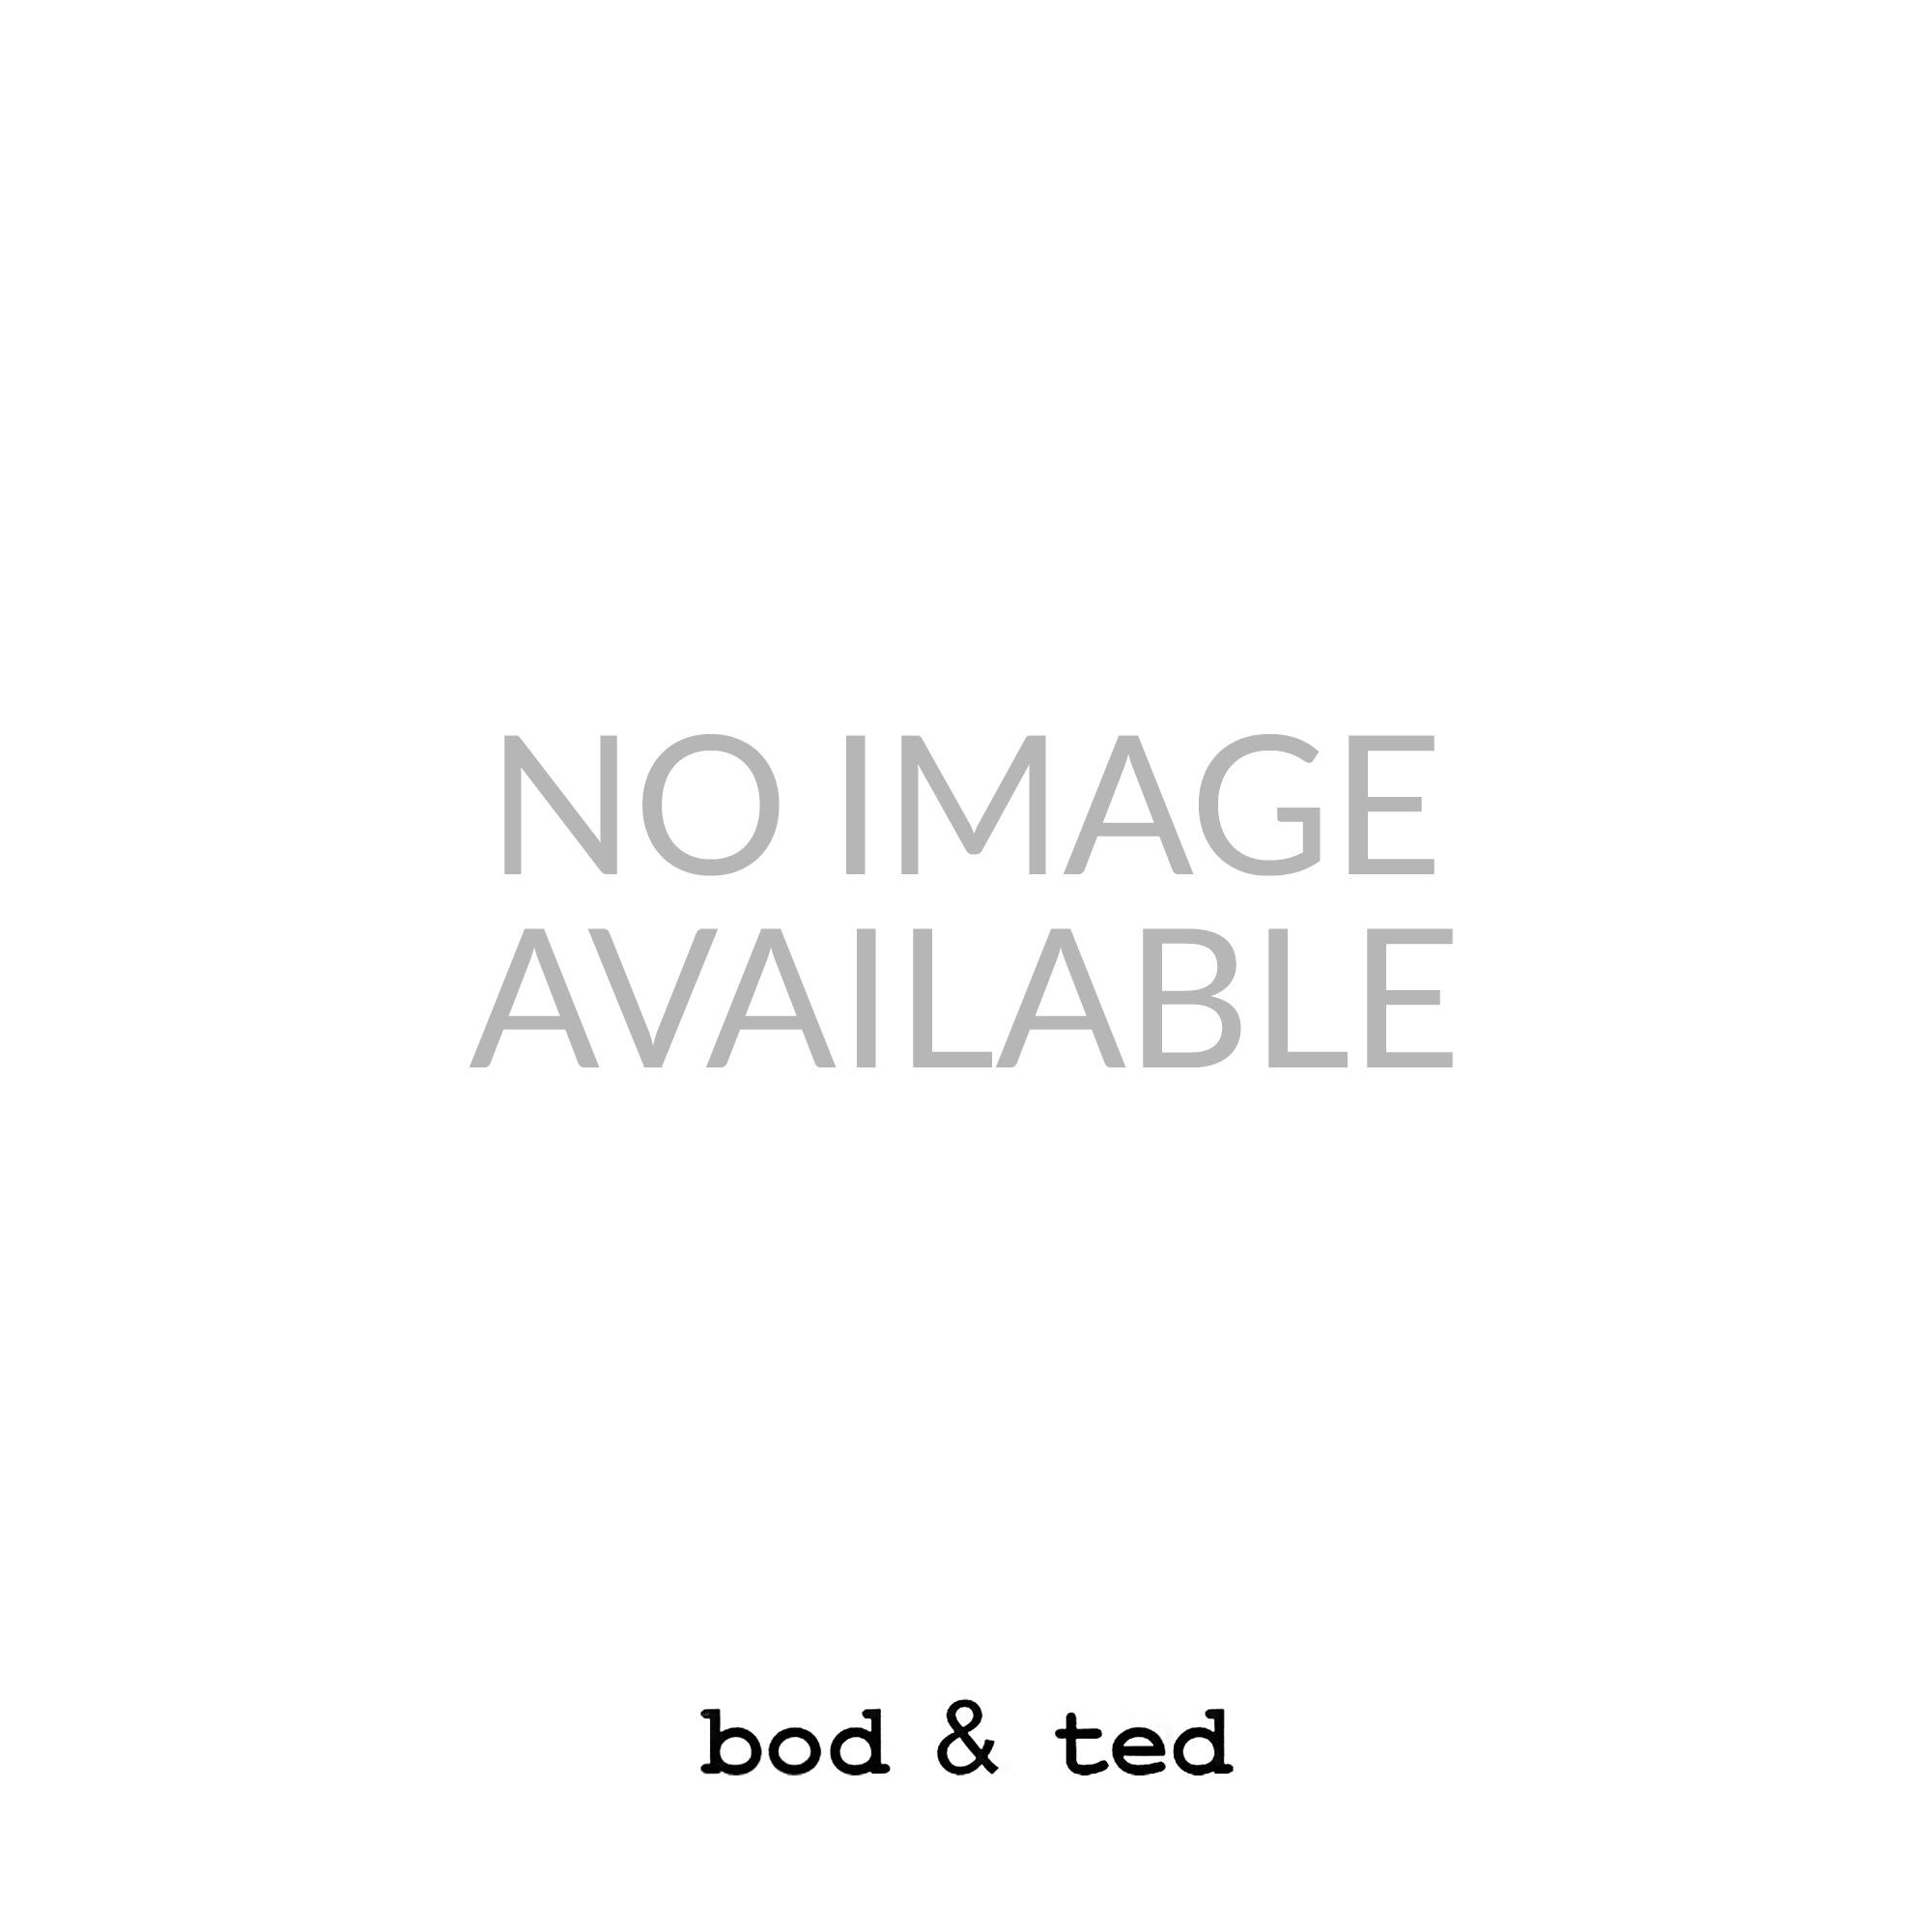 Skandinavisk LEMPI (LEM-PE) Scent Diffuser